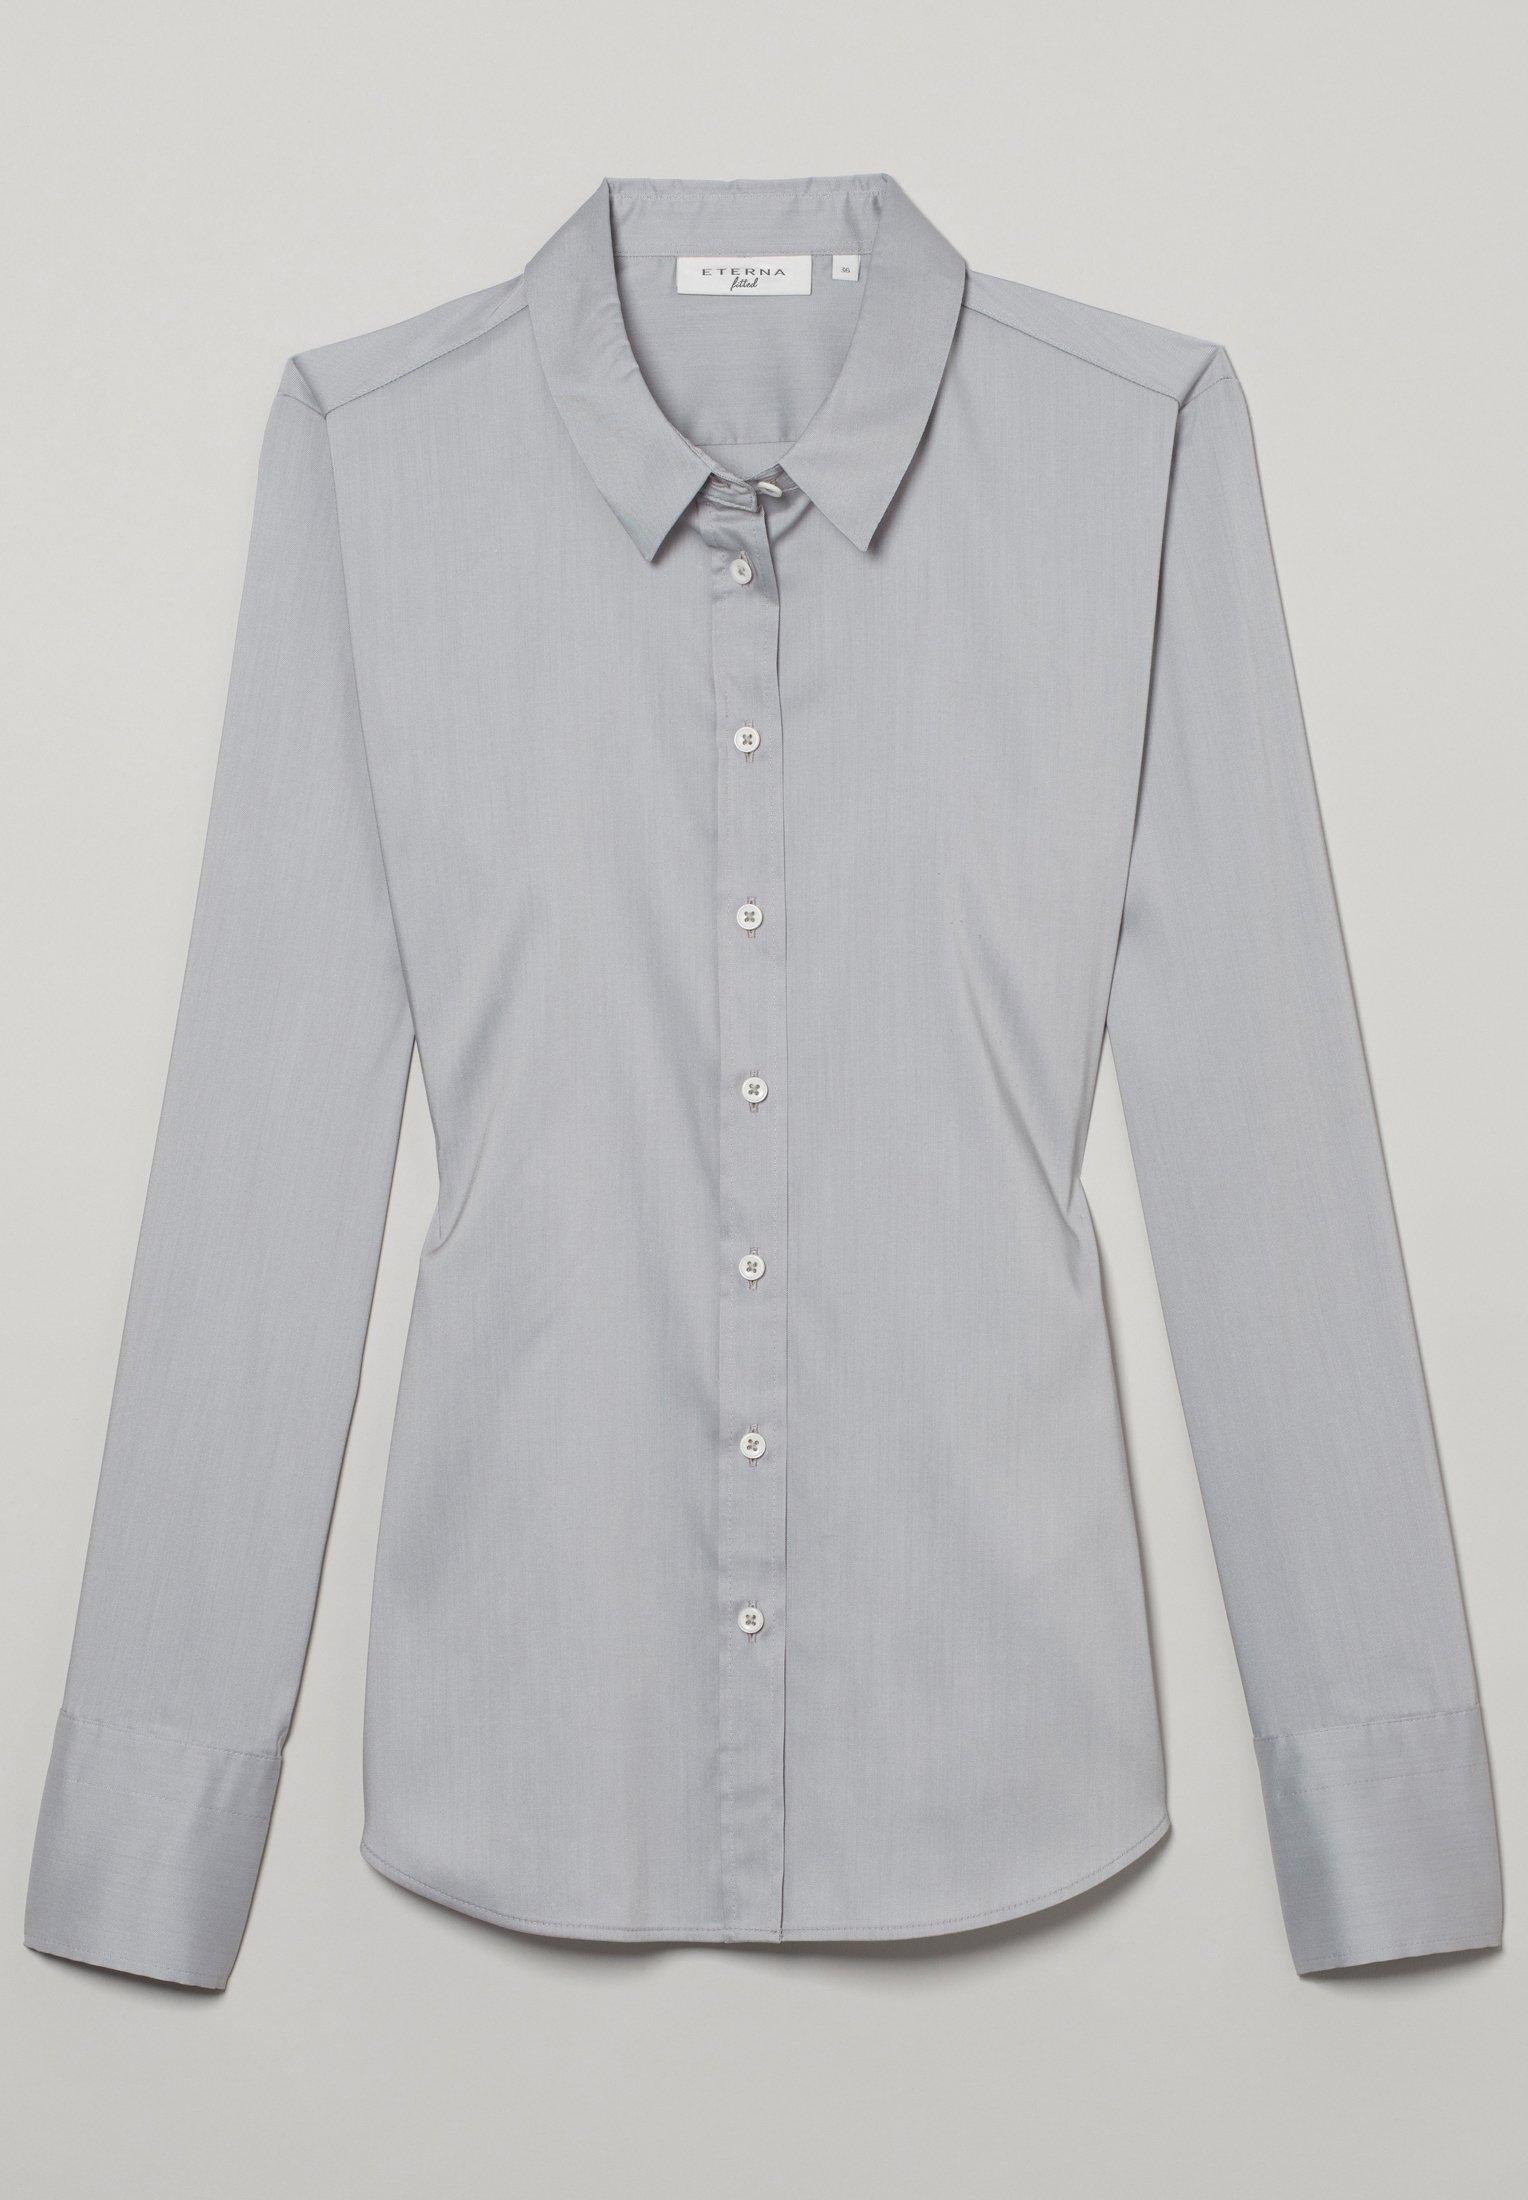 Eterna Overhemdblouse MODERN CLASSIC Lange mouwen - verschillende betaalmethodes